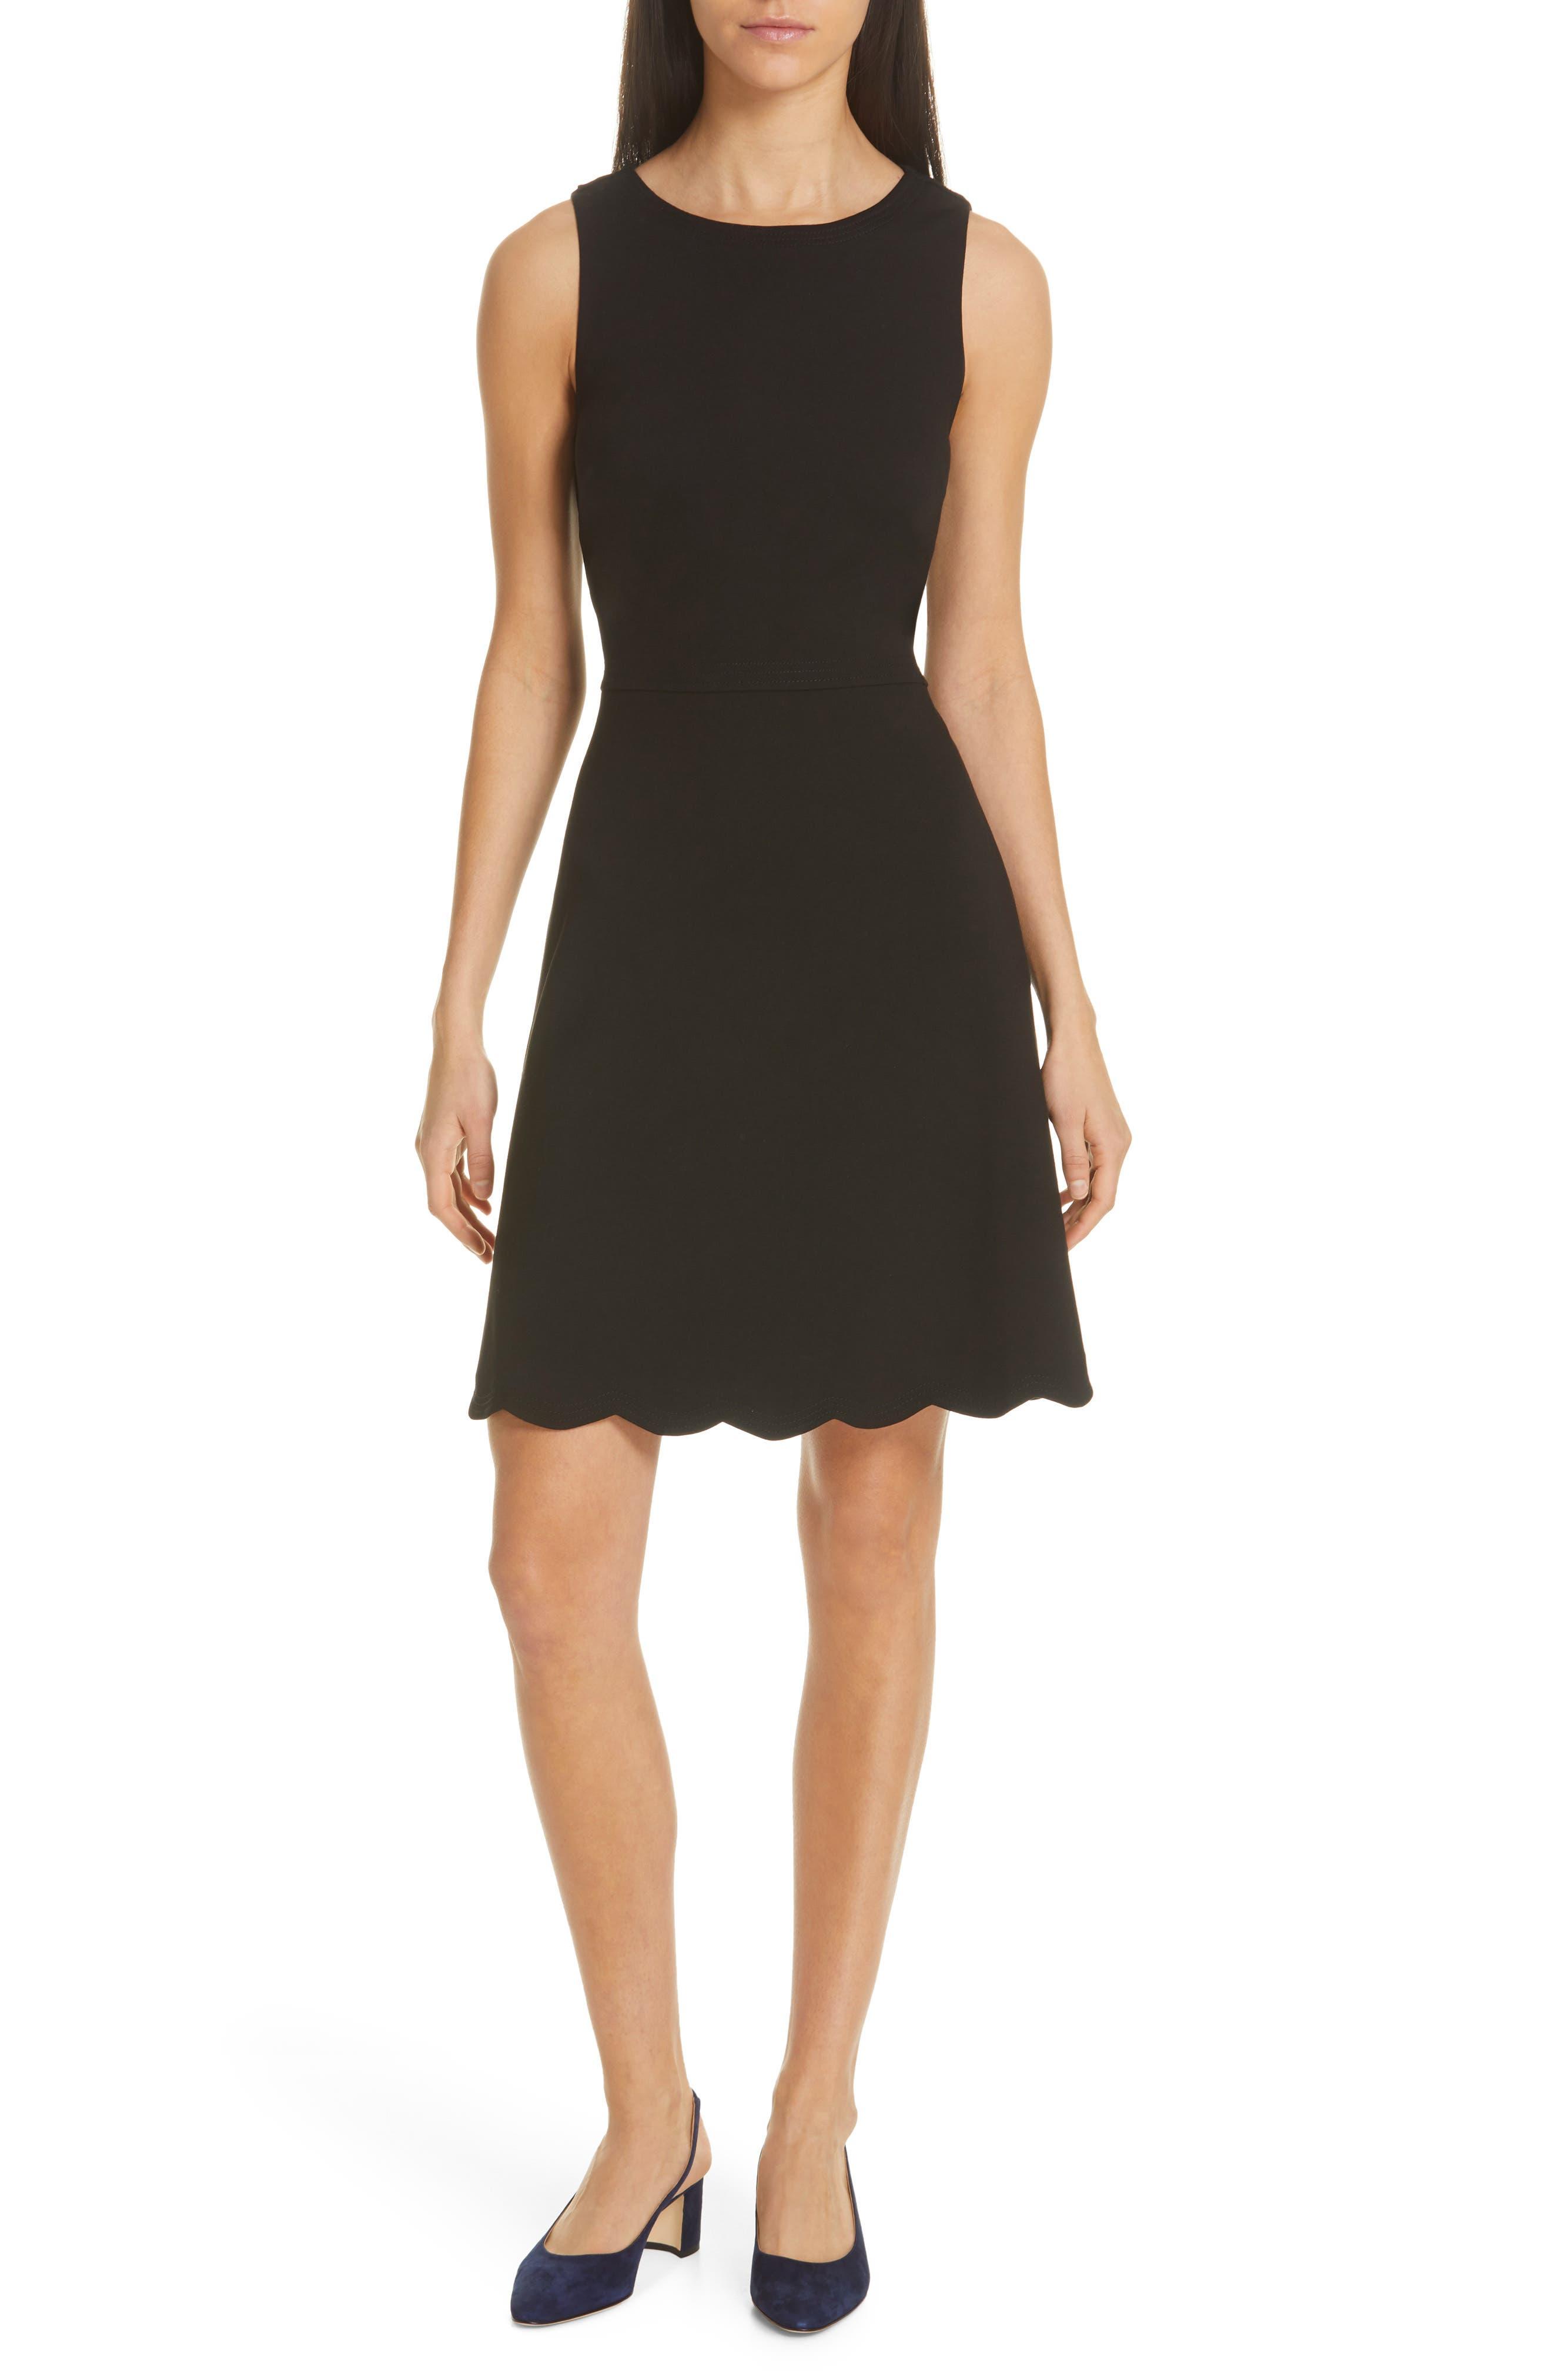 Kate Spade New York Scalloped Ponte Dress, Black